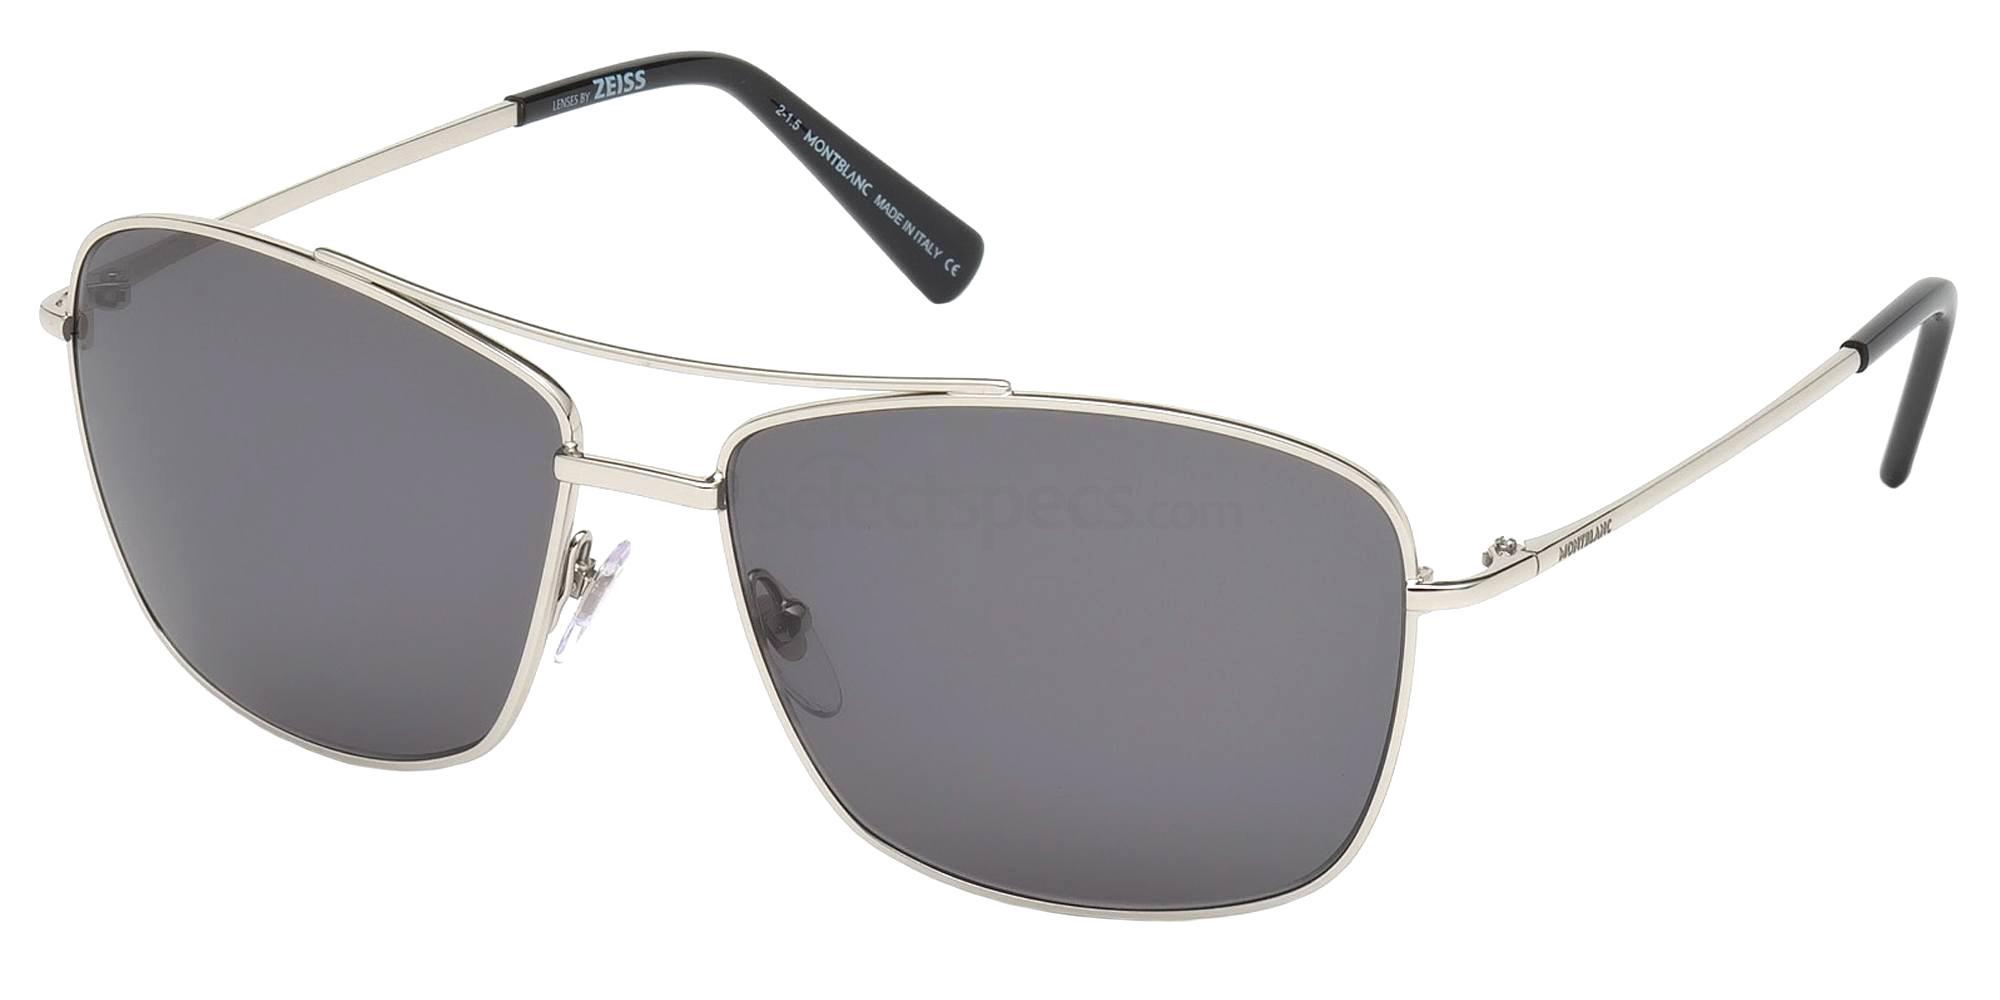 16A MB548S Sunglasses, Mont Blanc